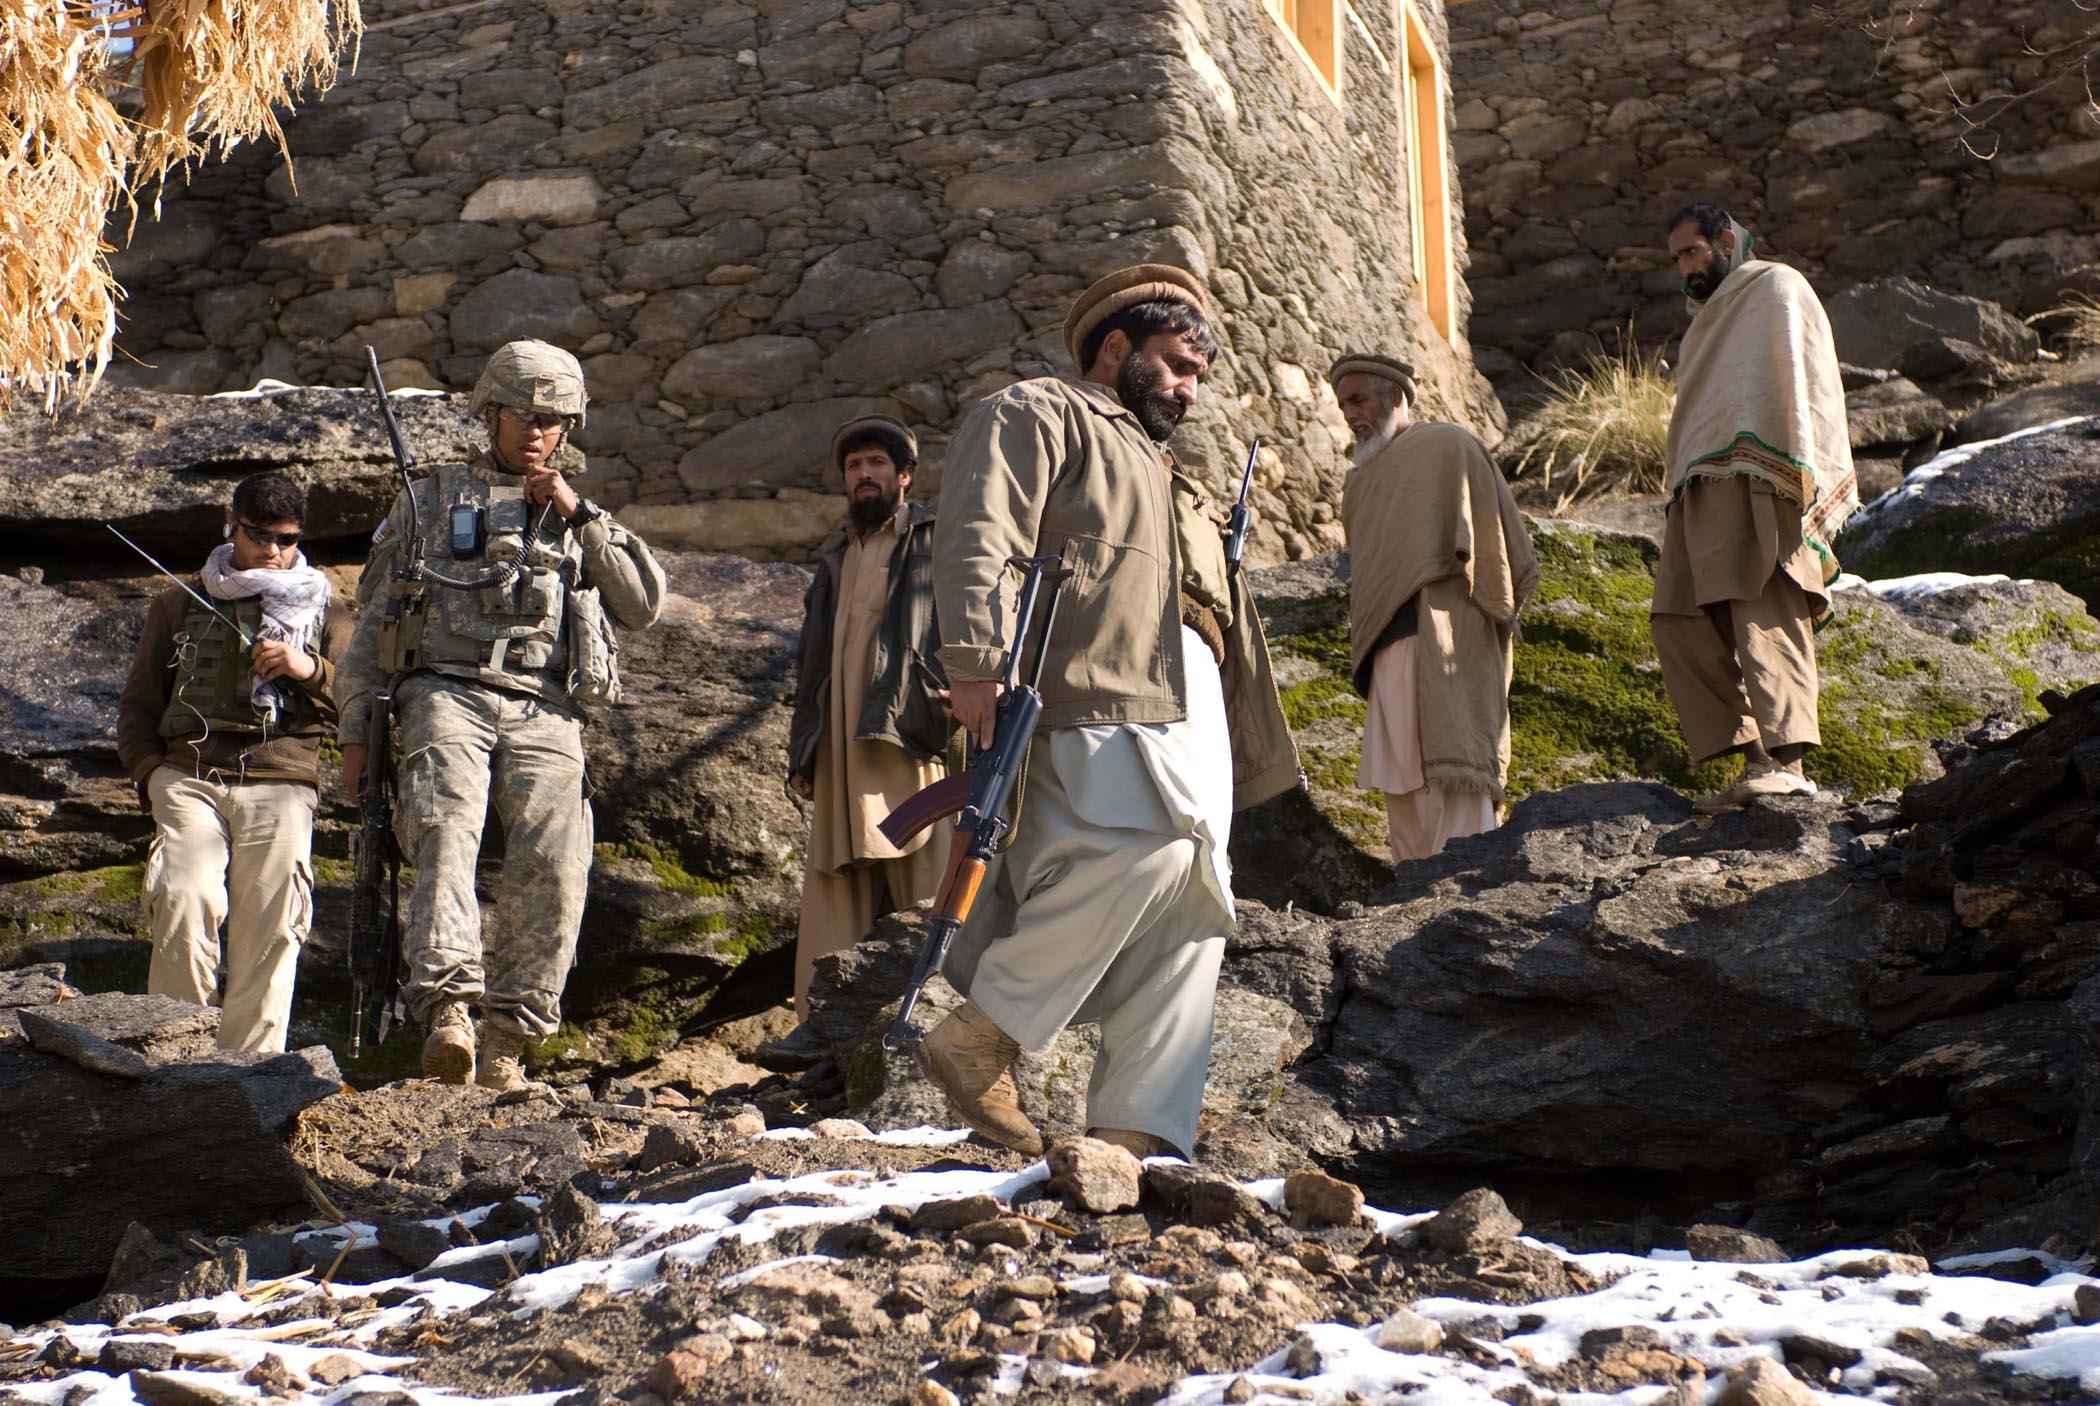 Description us army soldiers patrol in afghanistan